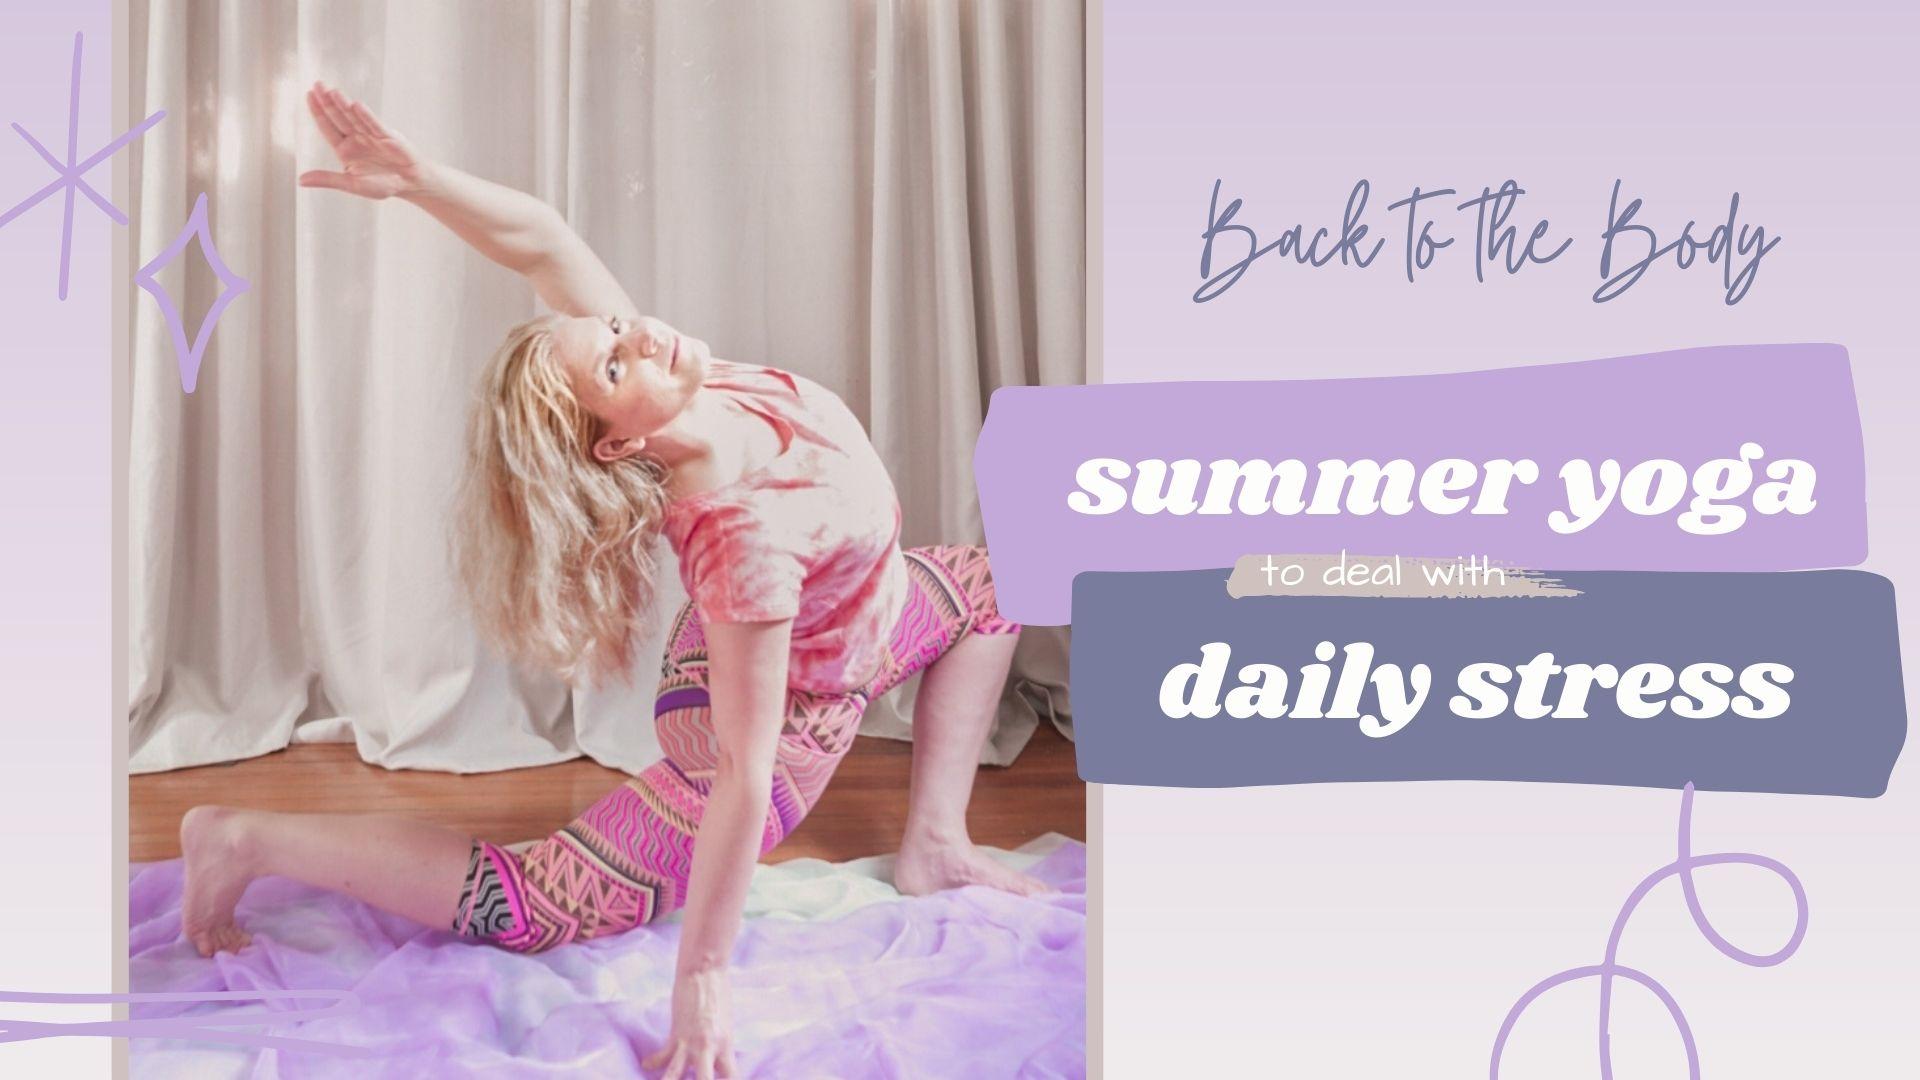 Summer Yoga Daily Stress